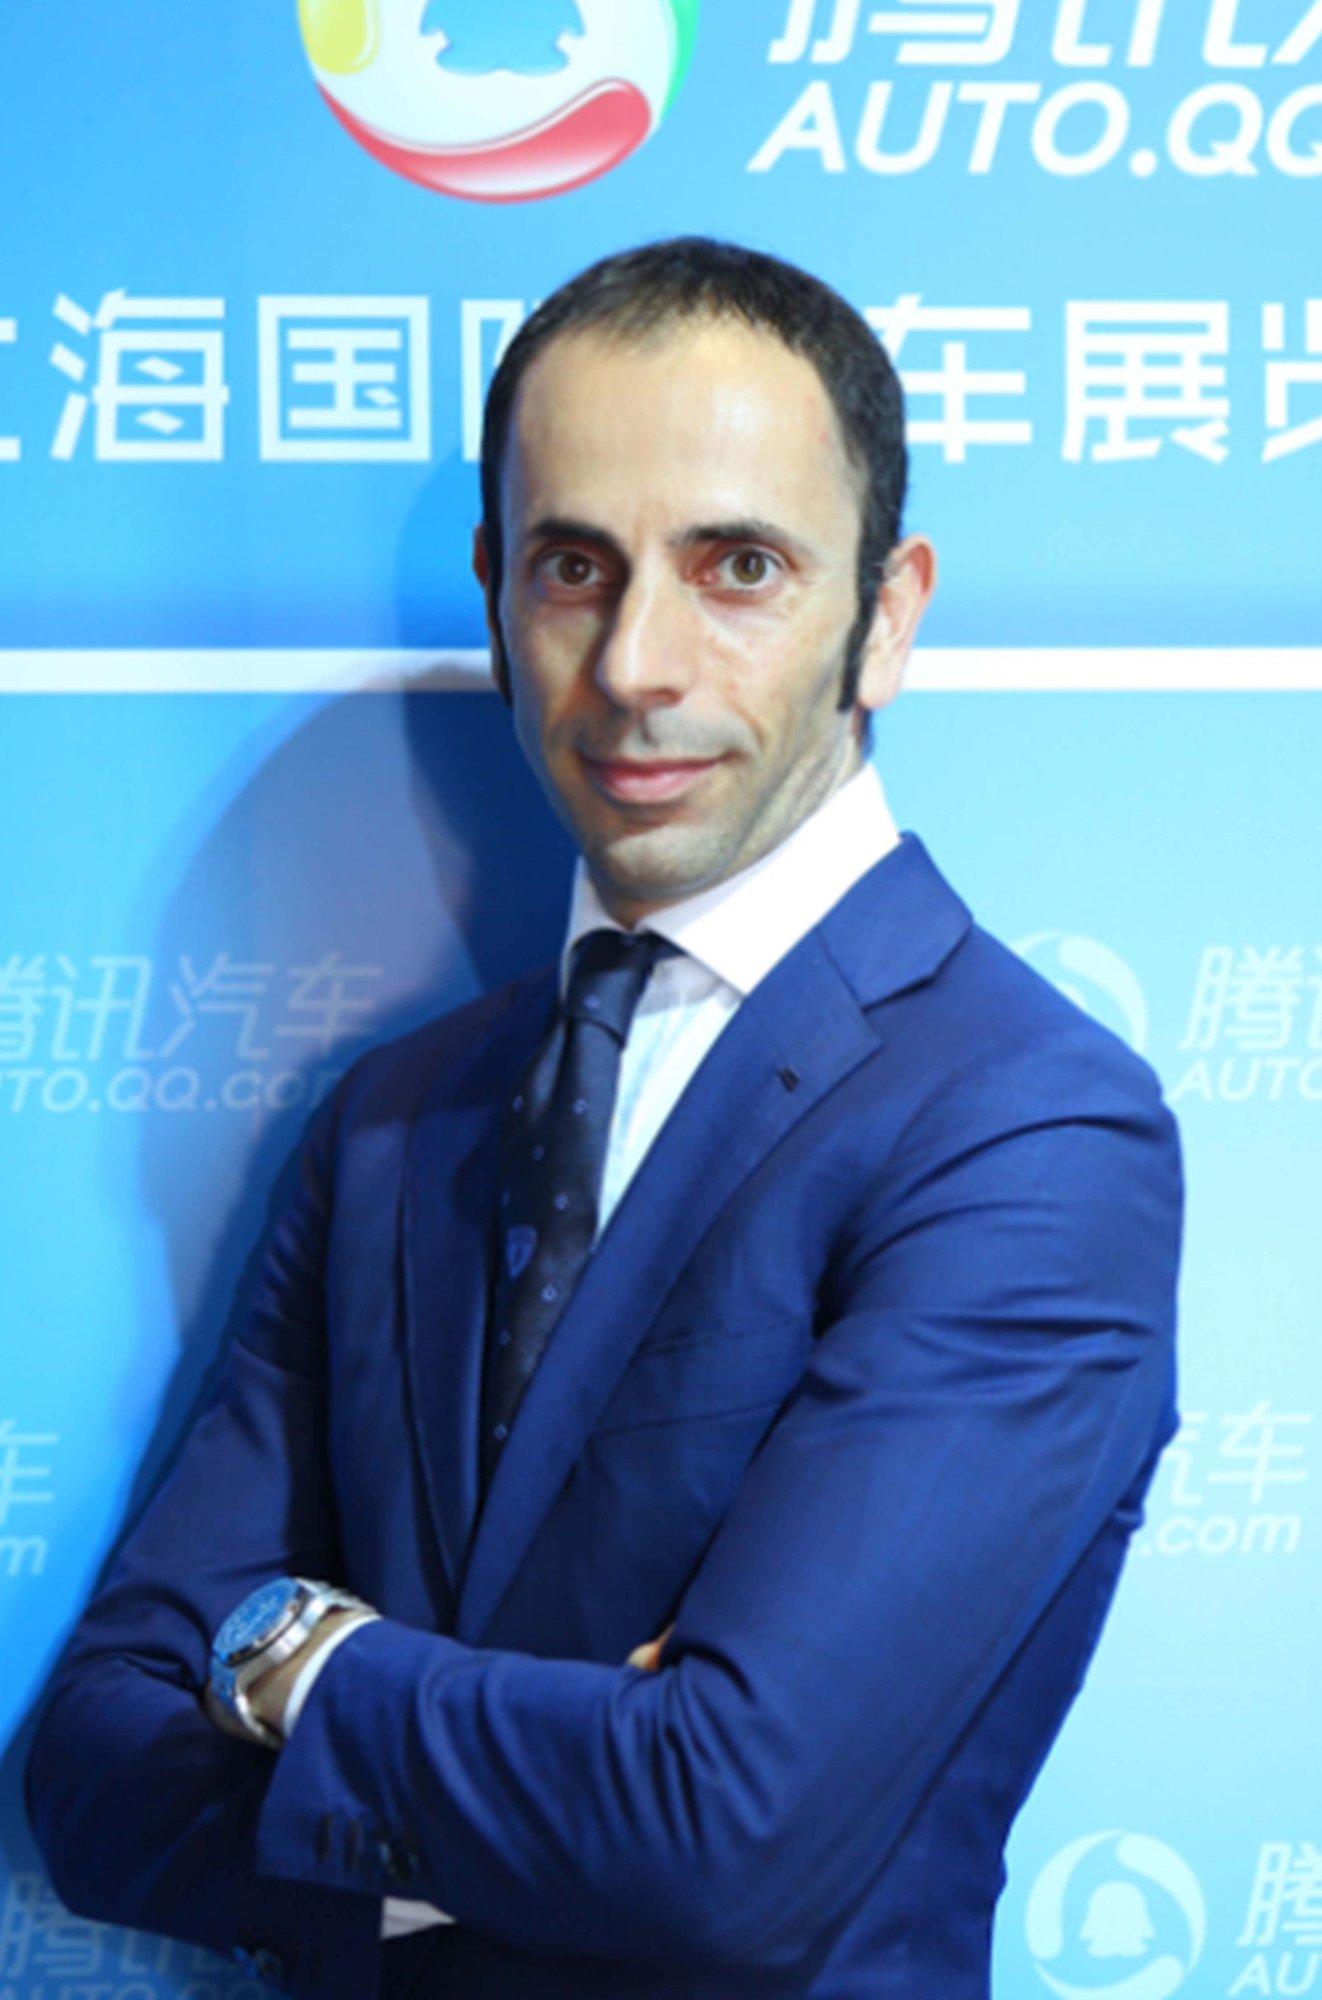 Francesco Scardaoin